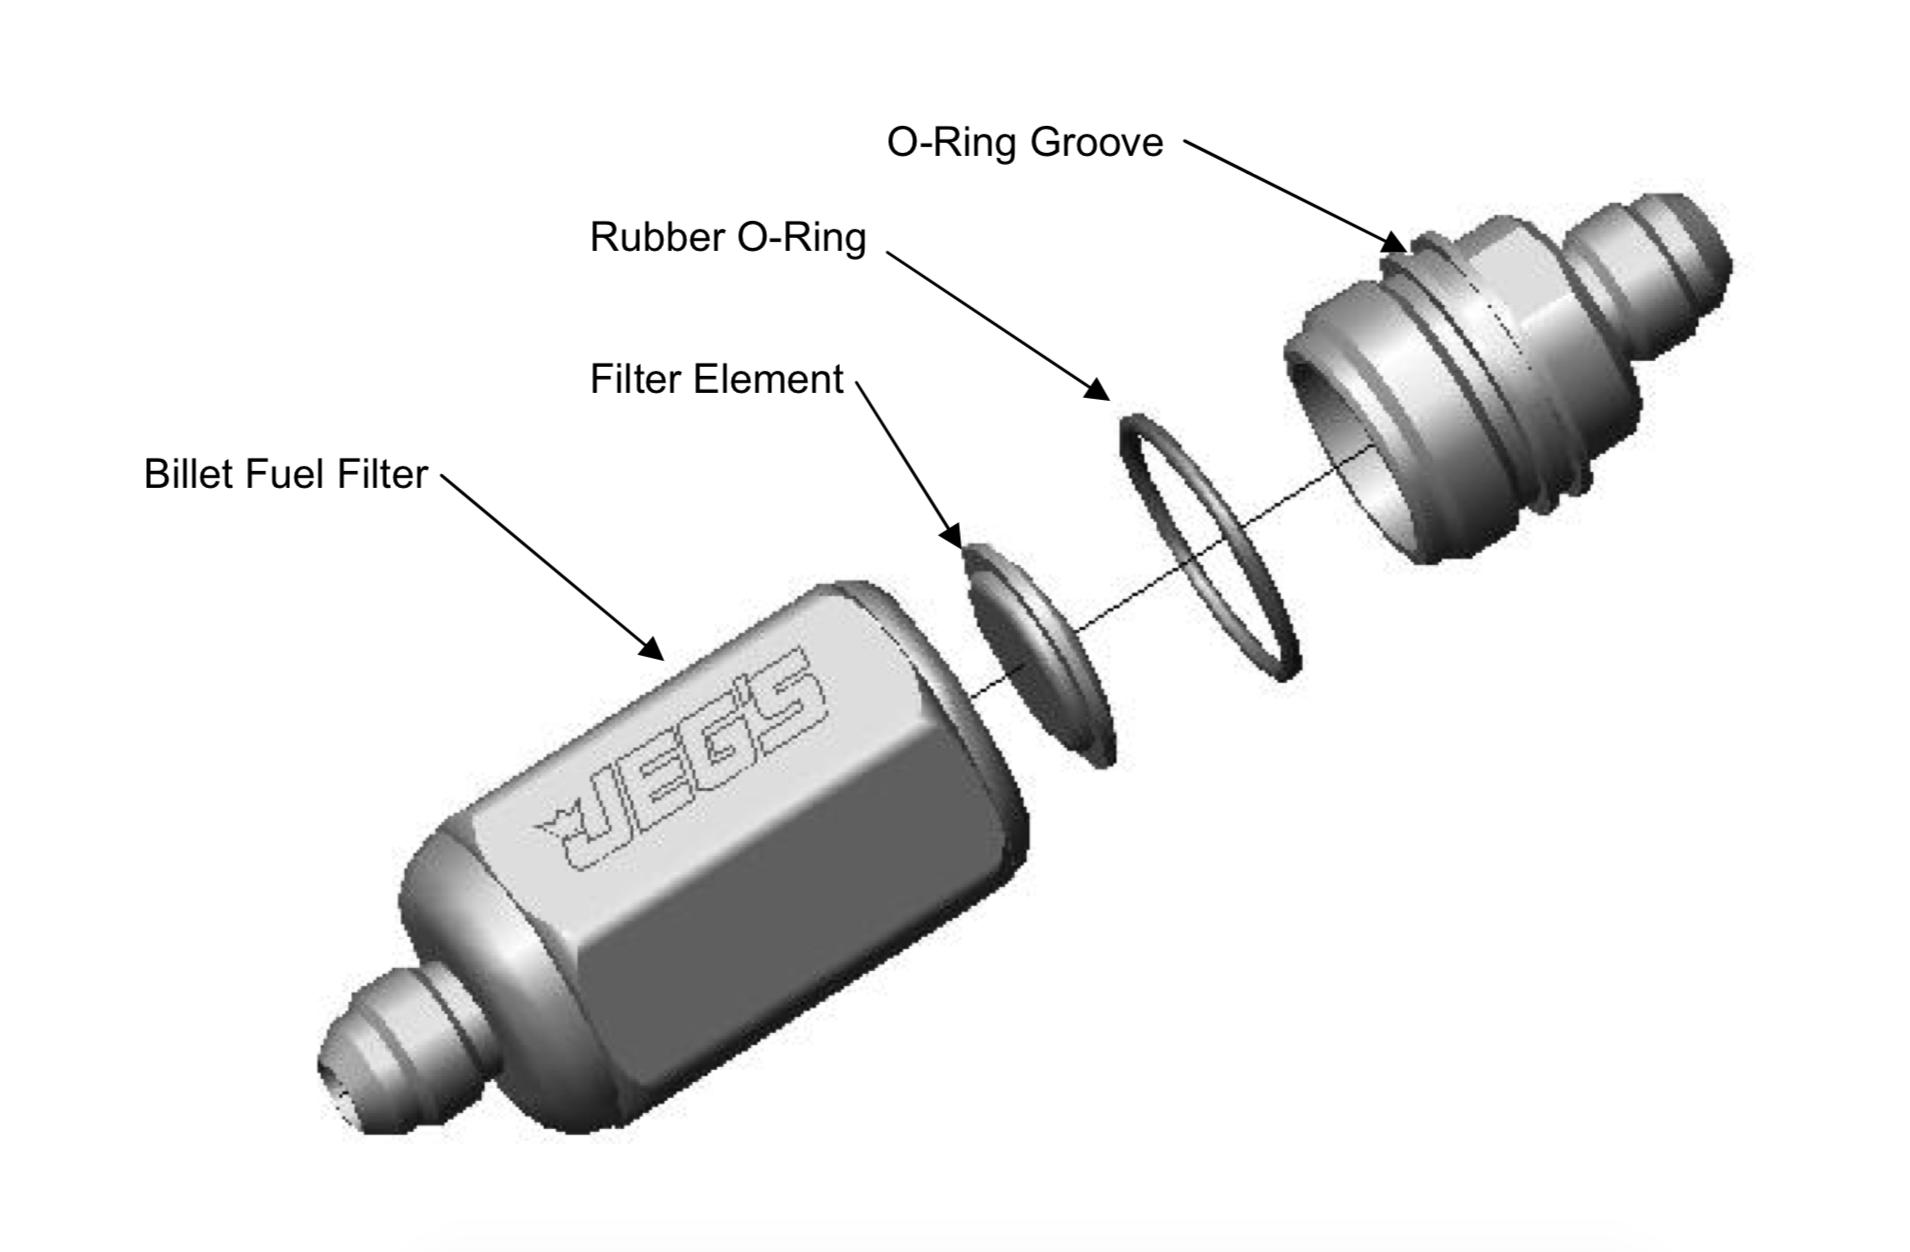 diagram showing billet fuel filter parts